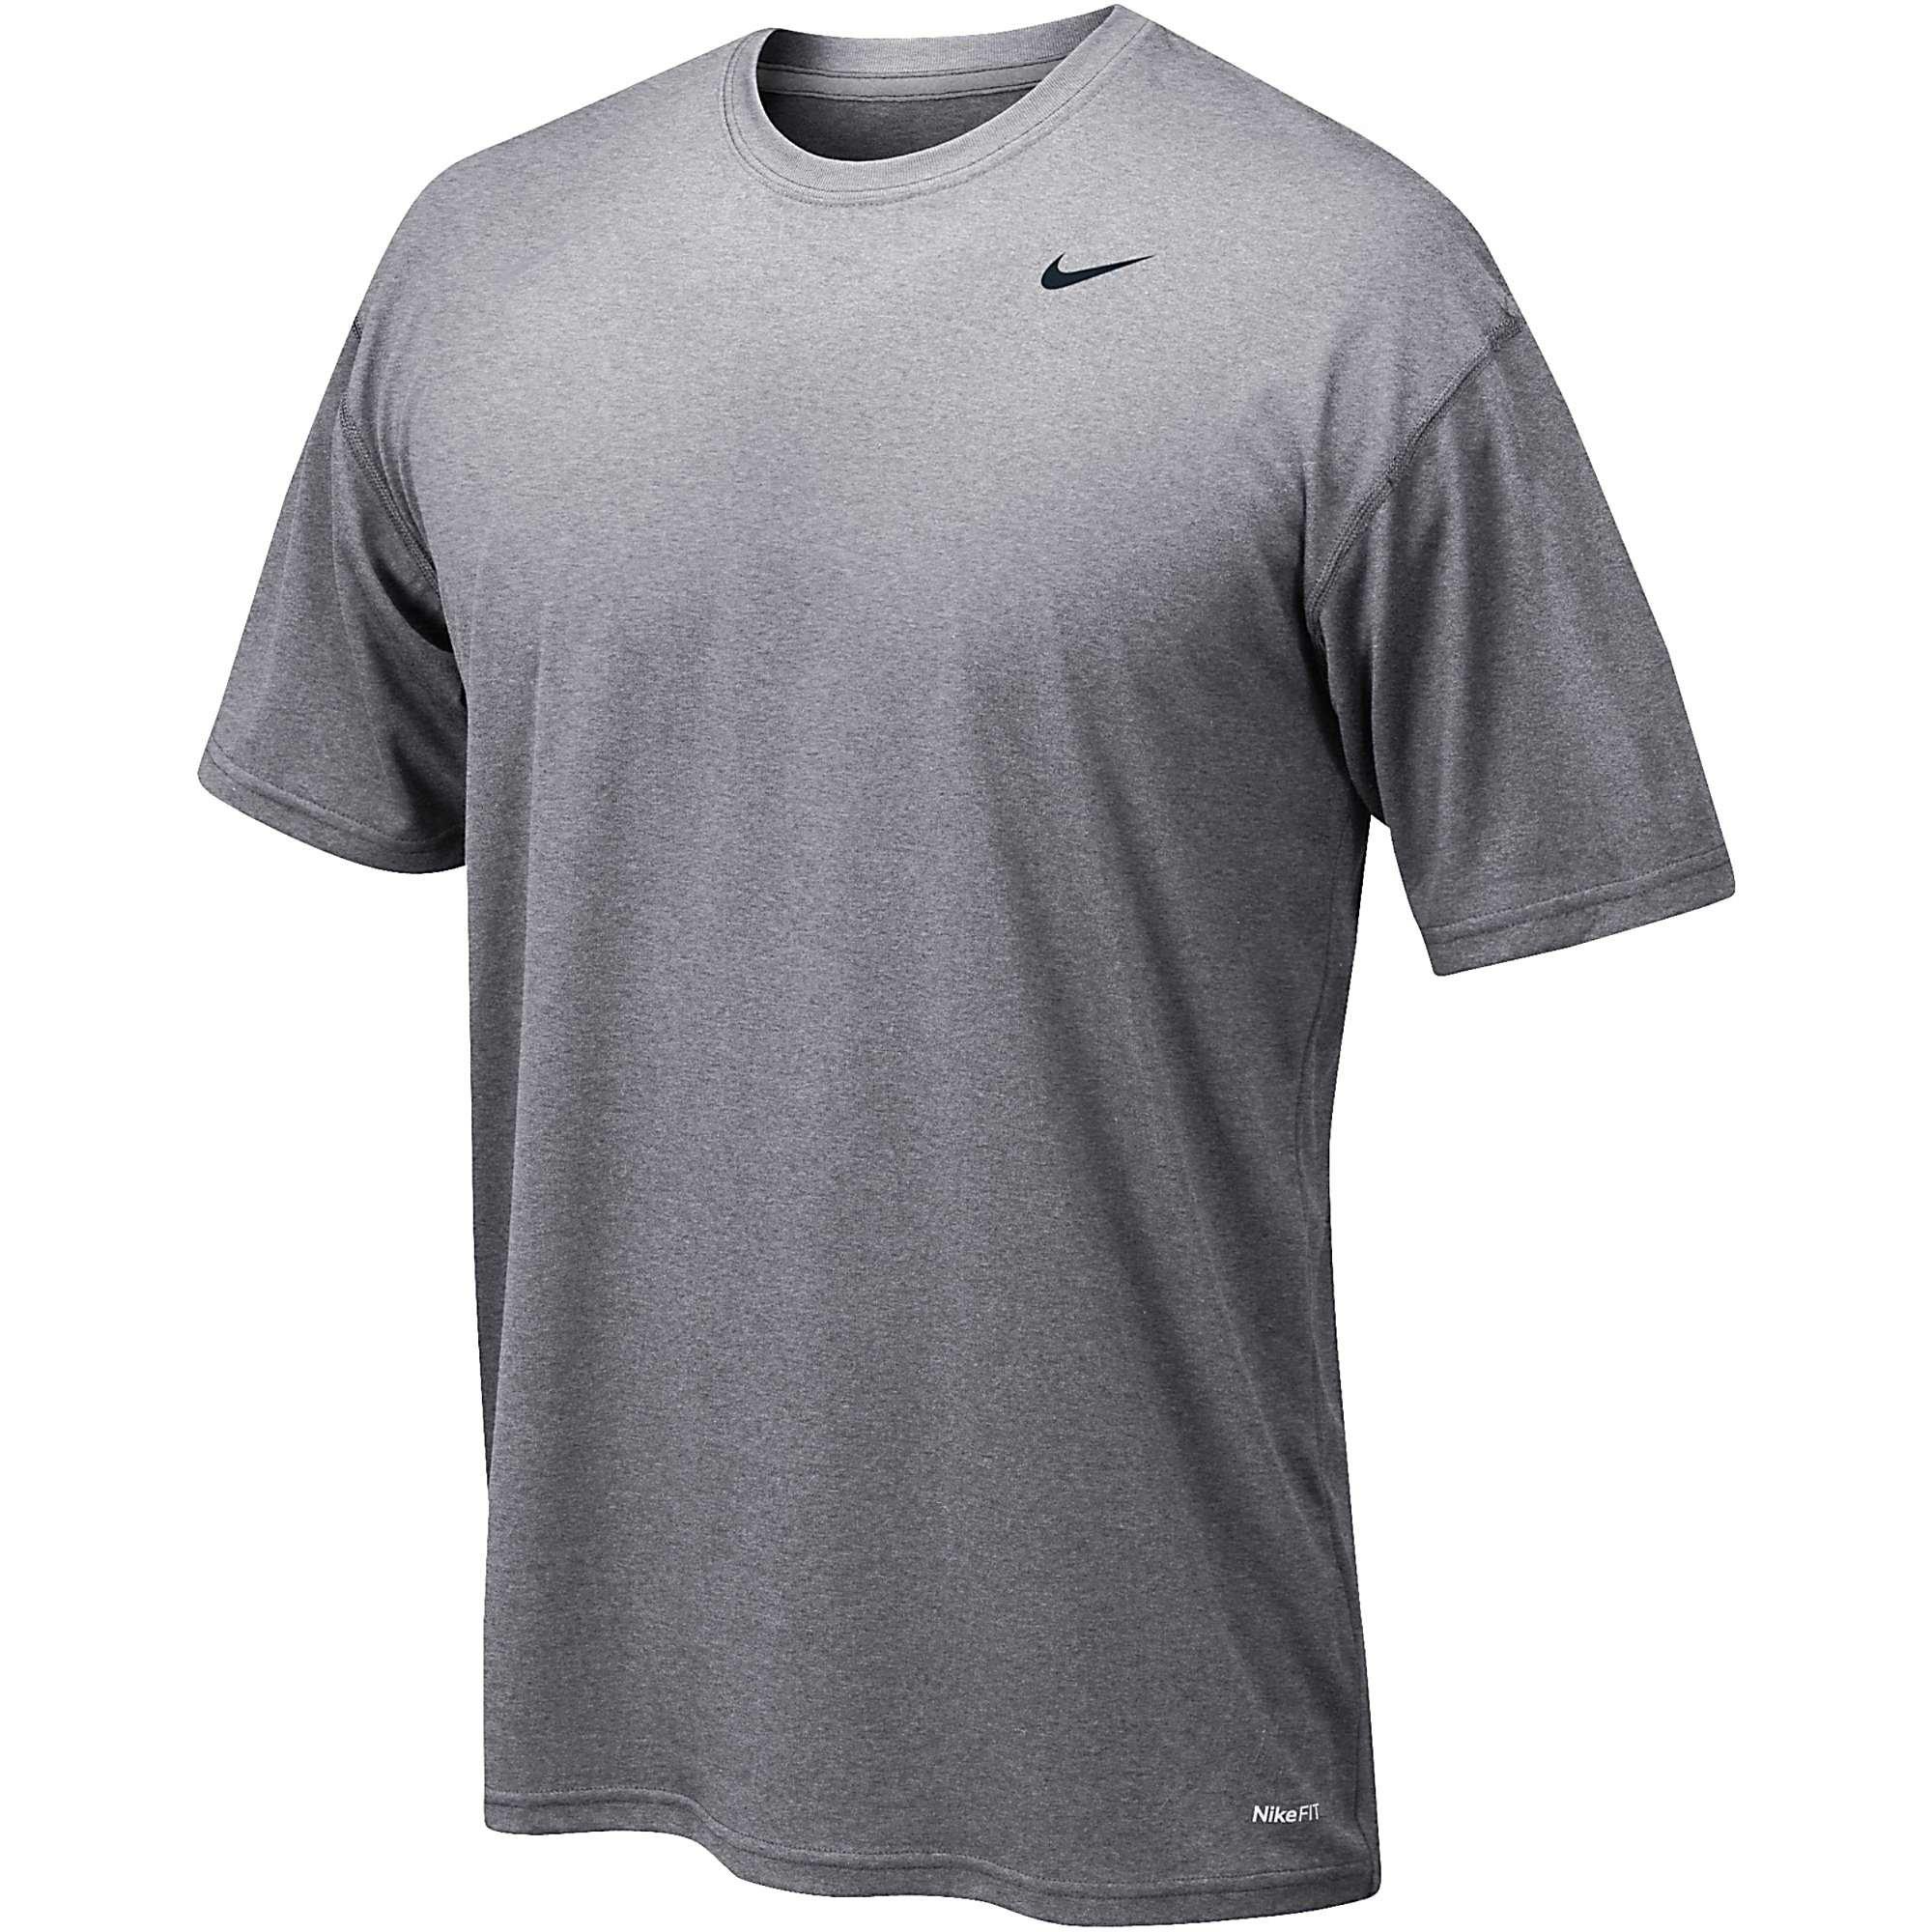 Nike 384407 Legend Dri-Fit Short Sleeve Tee - Grey, Large by Nike